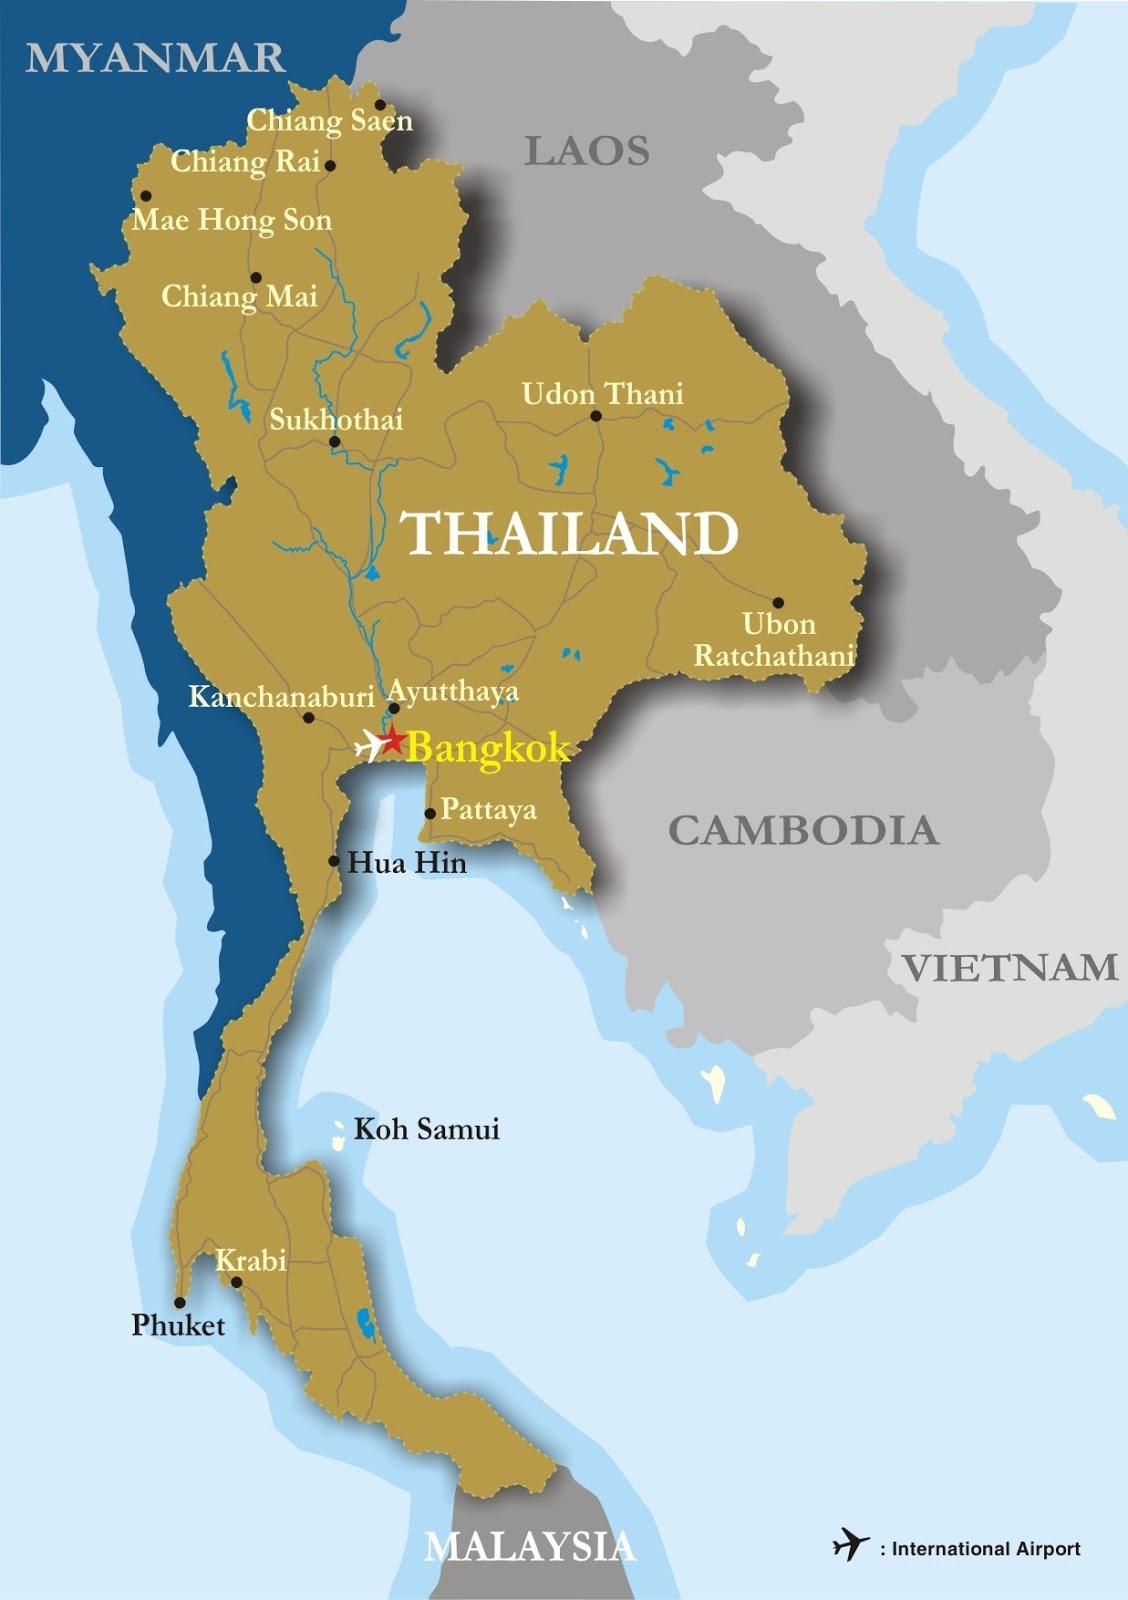 Hari Kemerdekaan Thailand